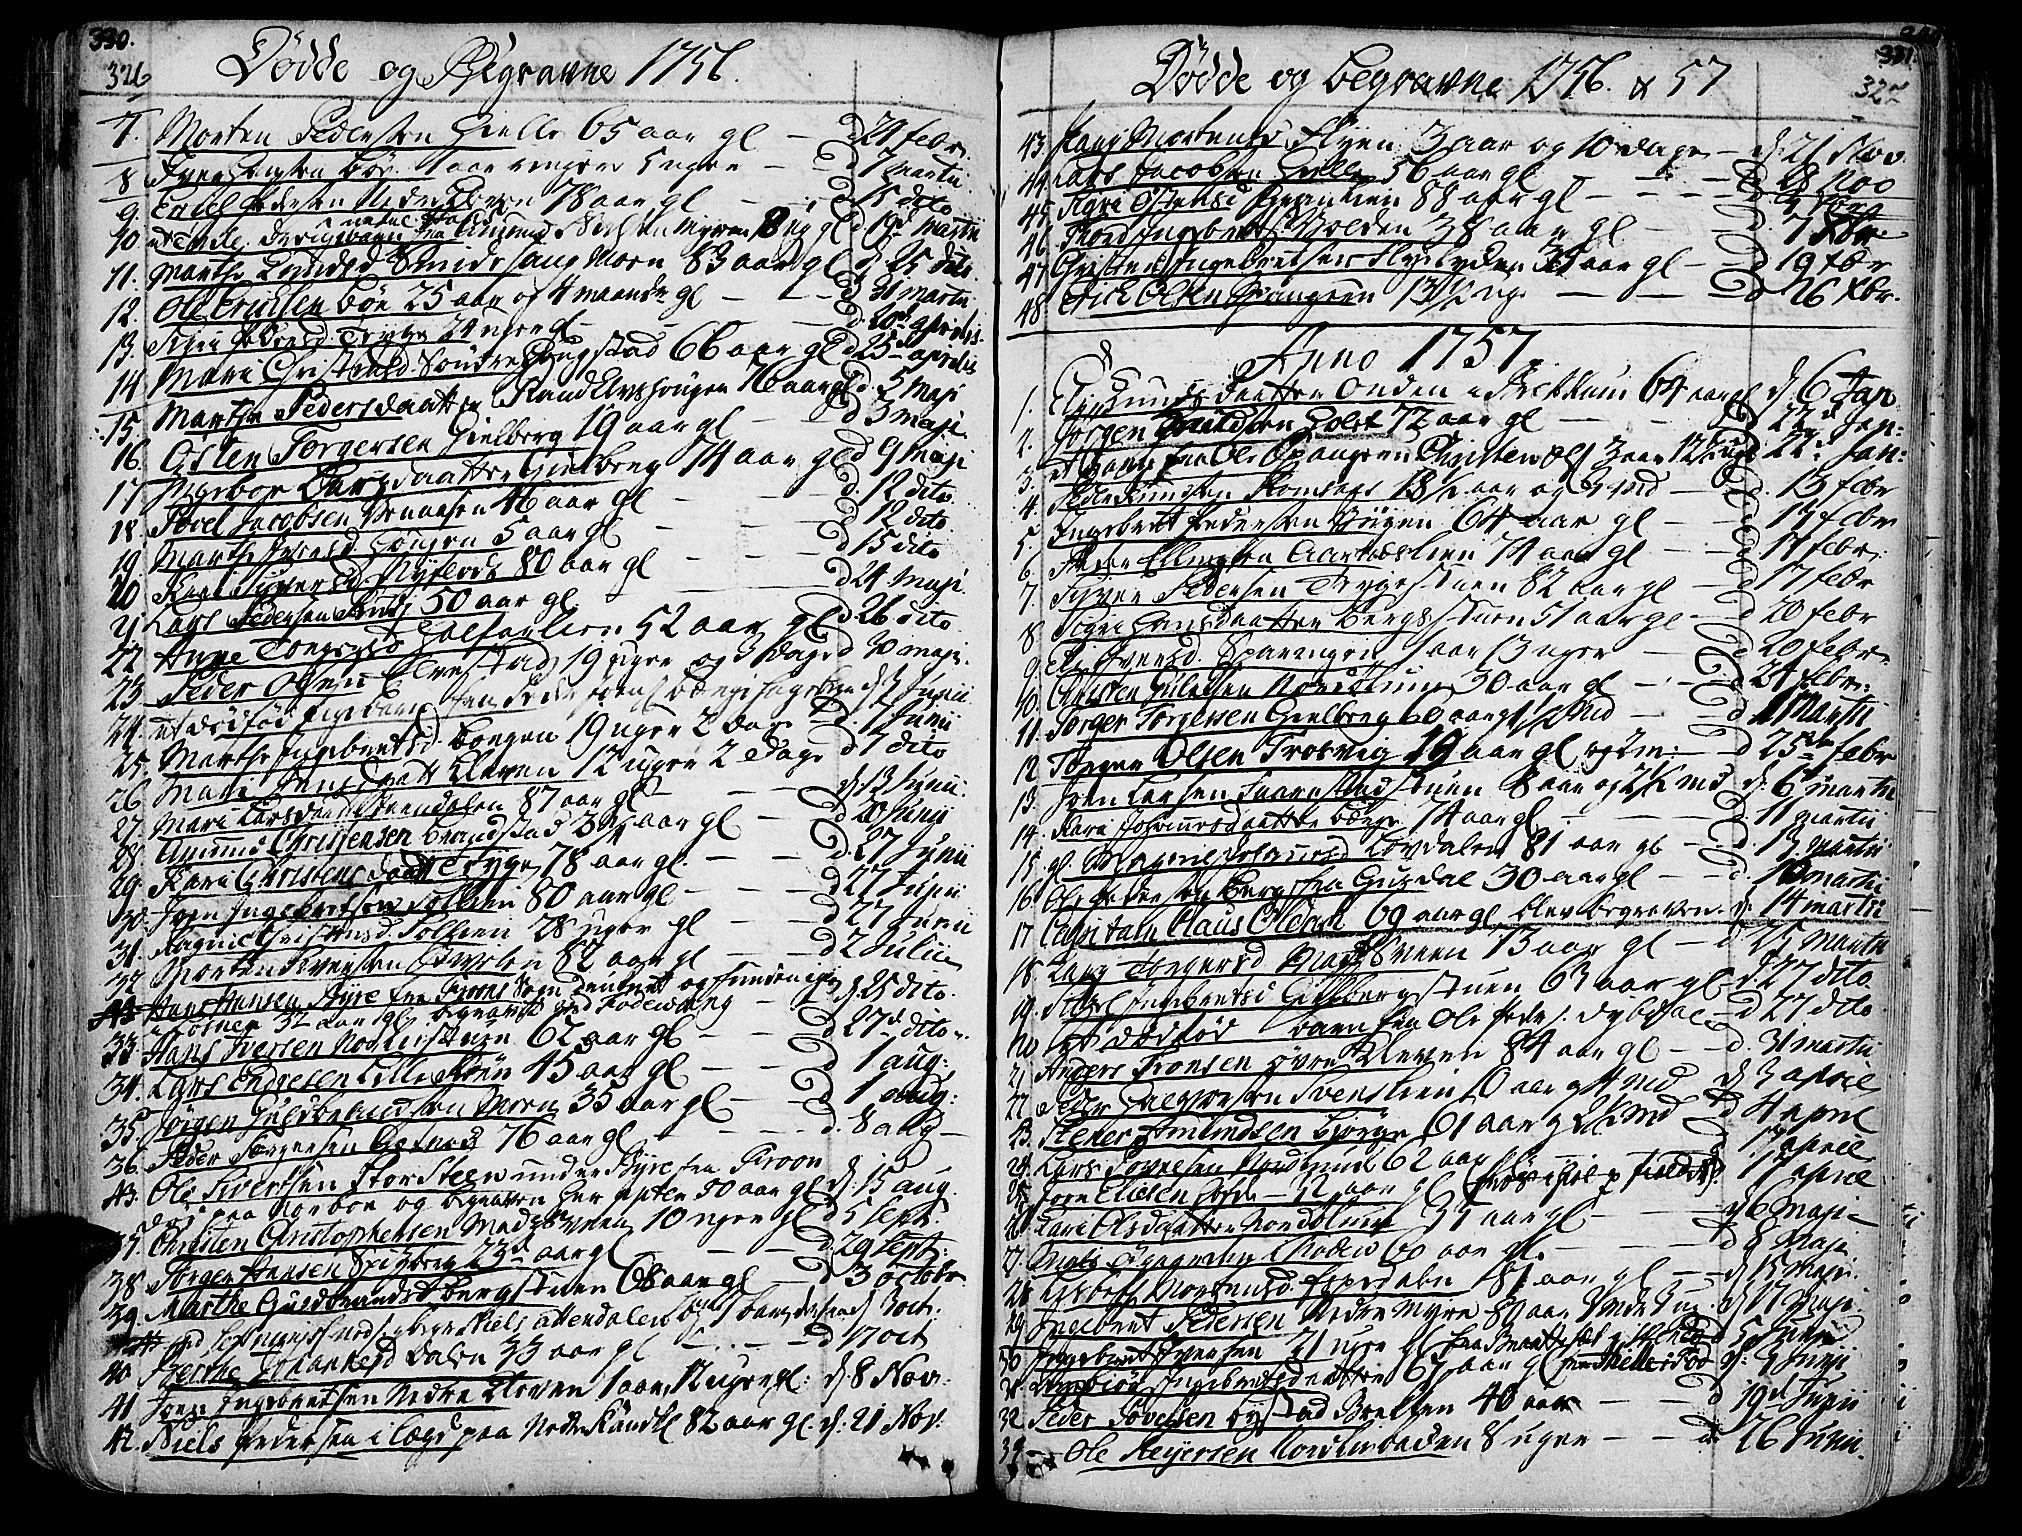 SAH, Ringebu prestekontor, Ministerialbok nr. 2, 1734-1780, s. 326-327